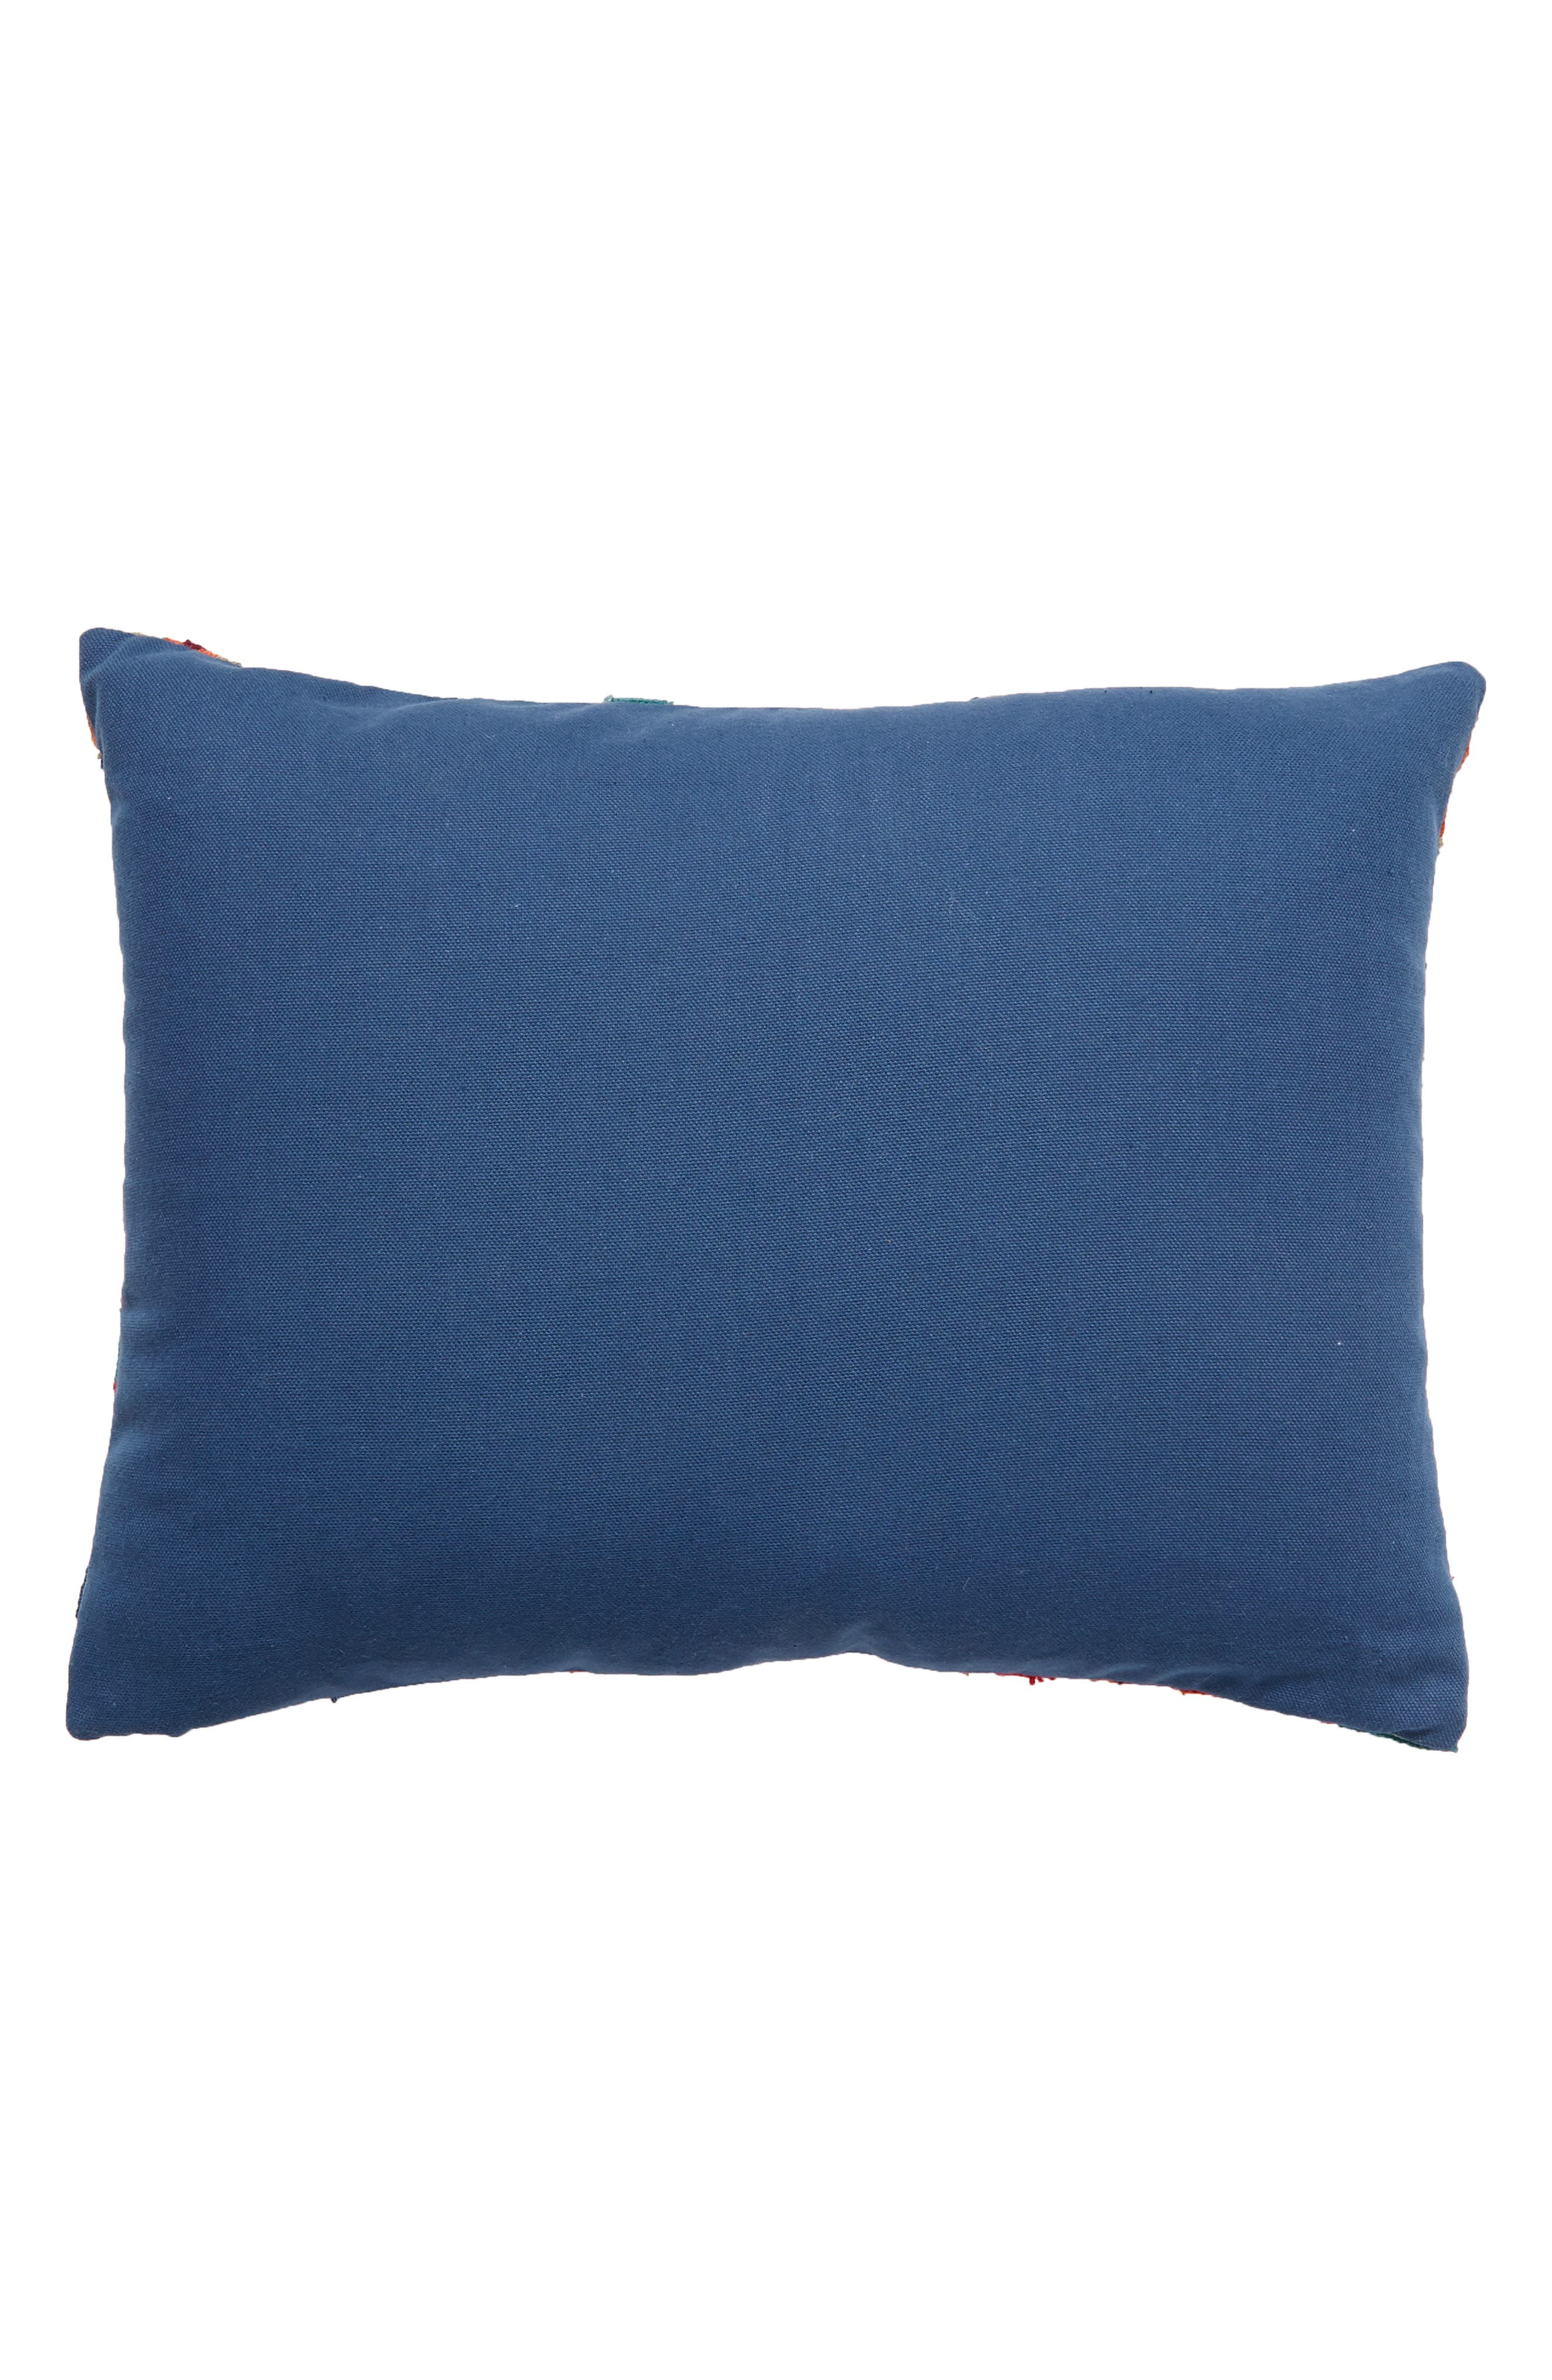 Carla Accent Pillow,                             Alternate thumbnail 2, color,                             400